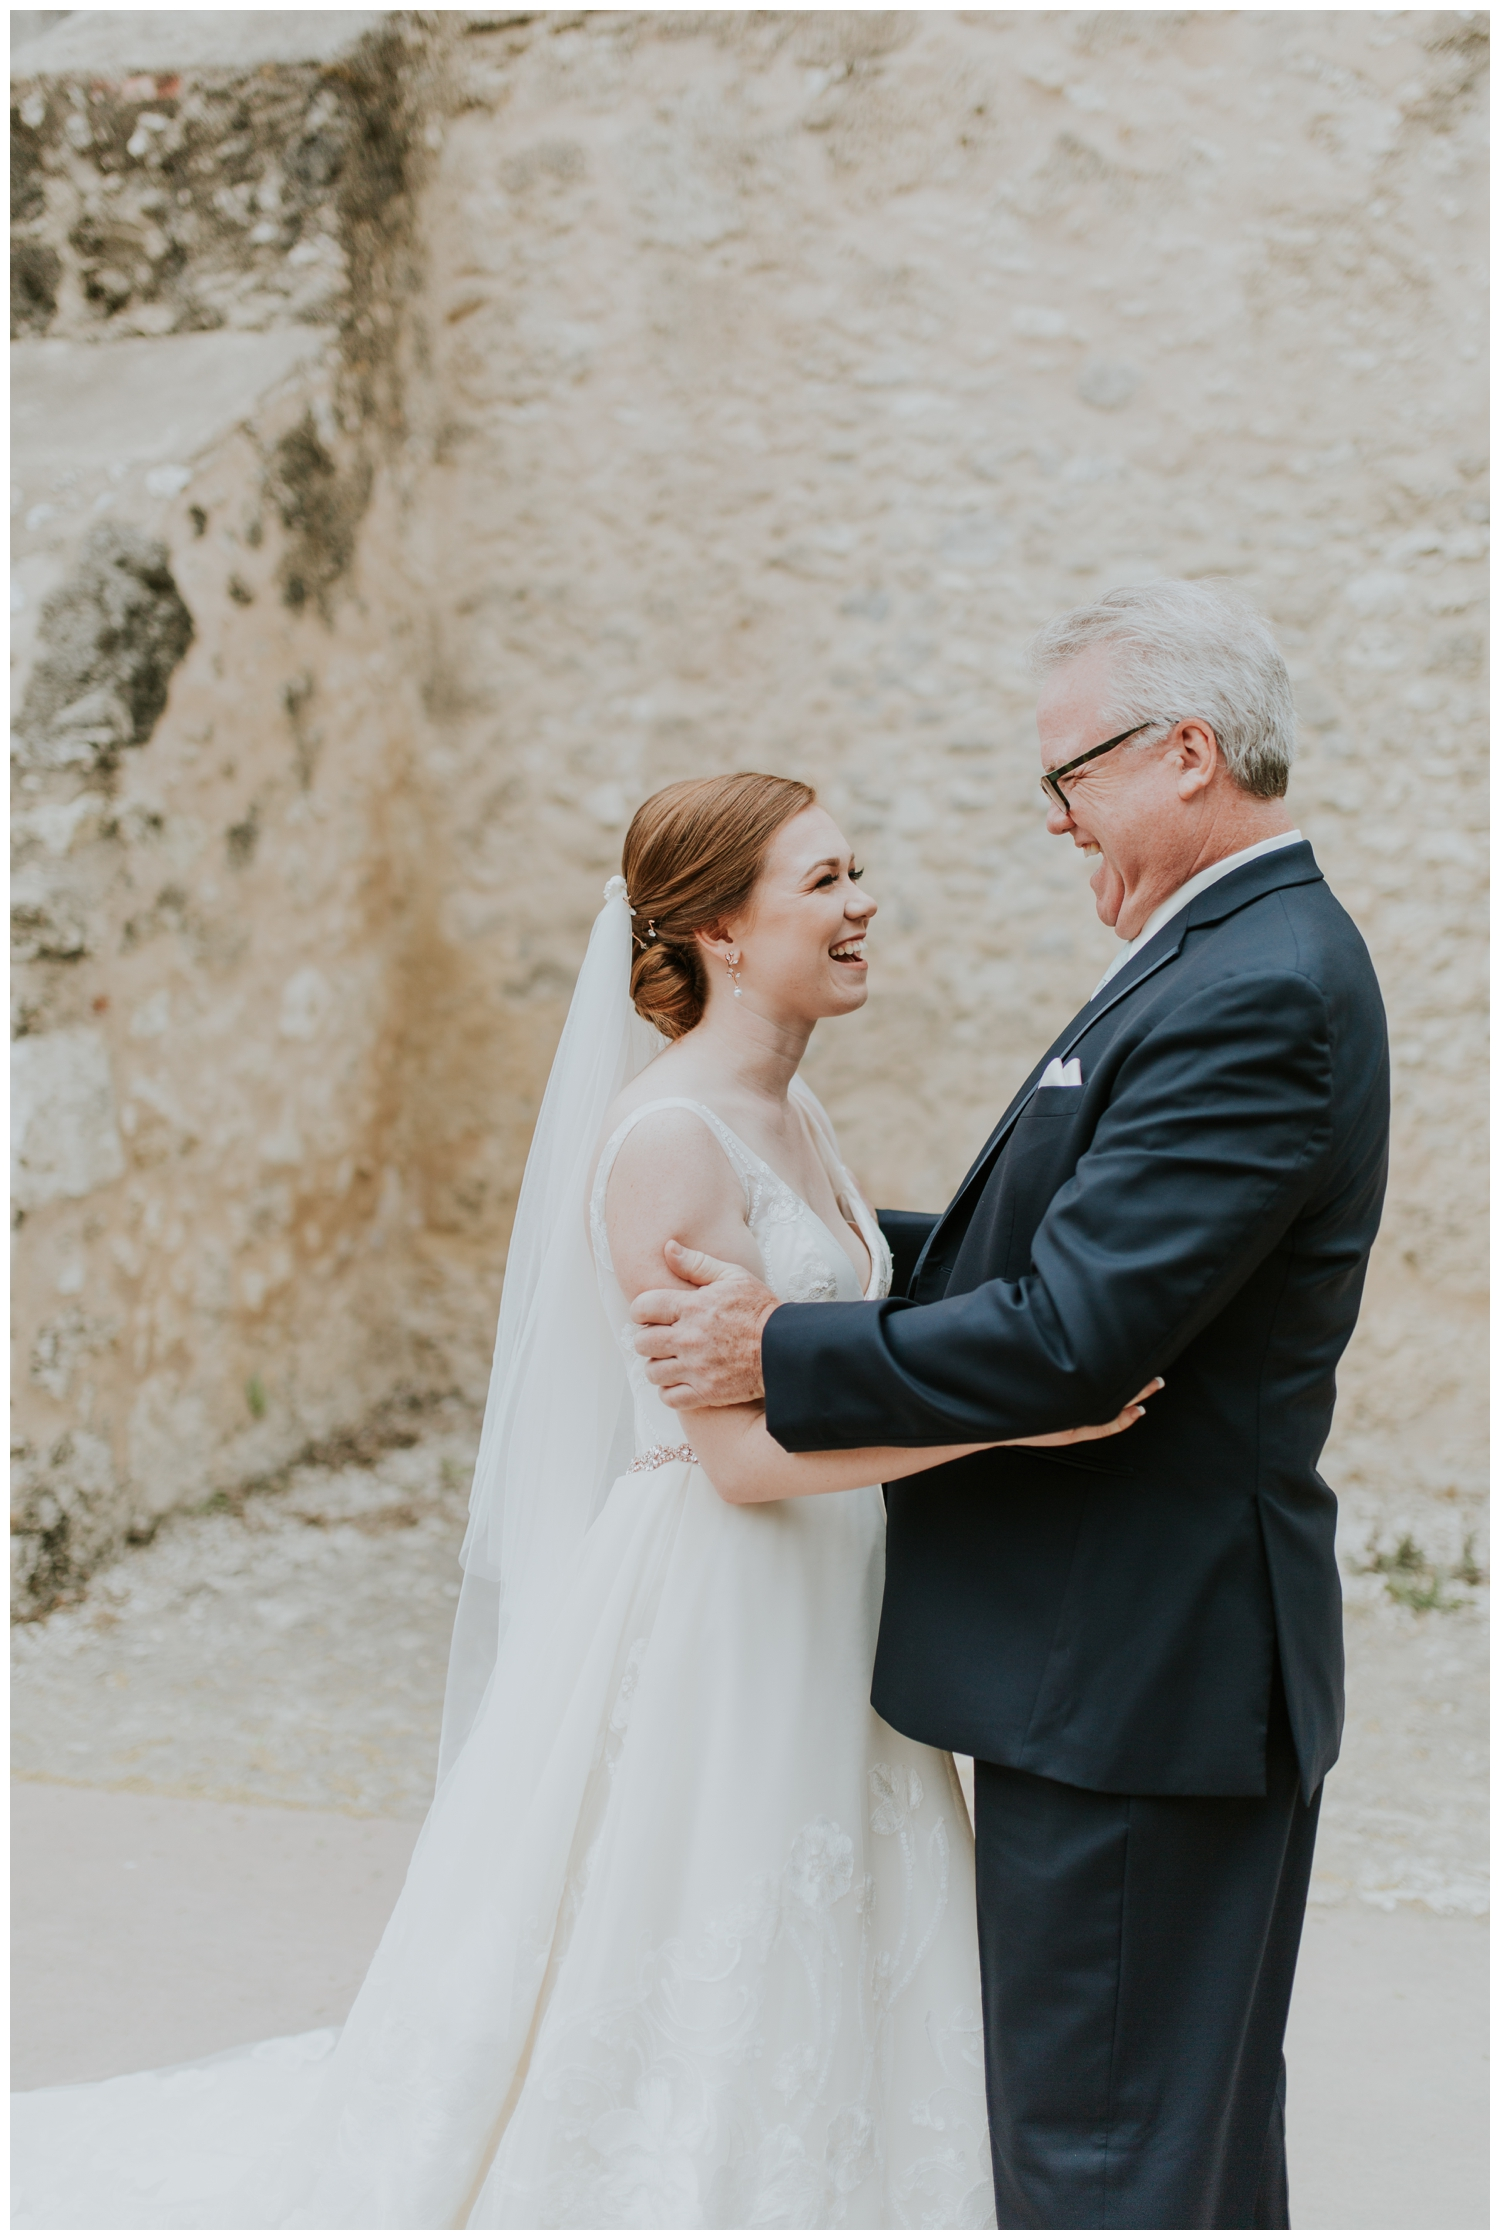 Jenna+Brandon, Mission Concepcion Wedding, San Antonio, Contista Productions Wedding Photography_0028.jpg